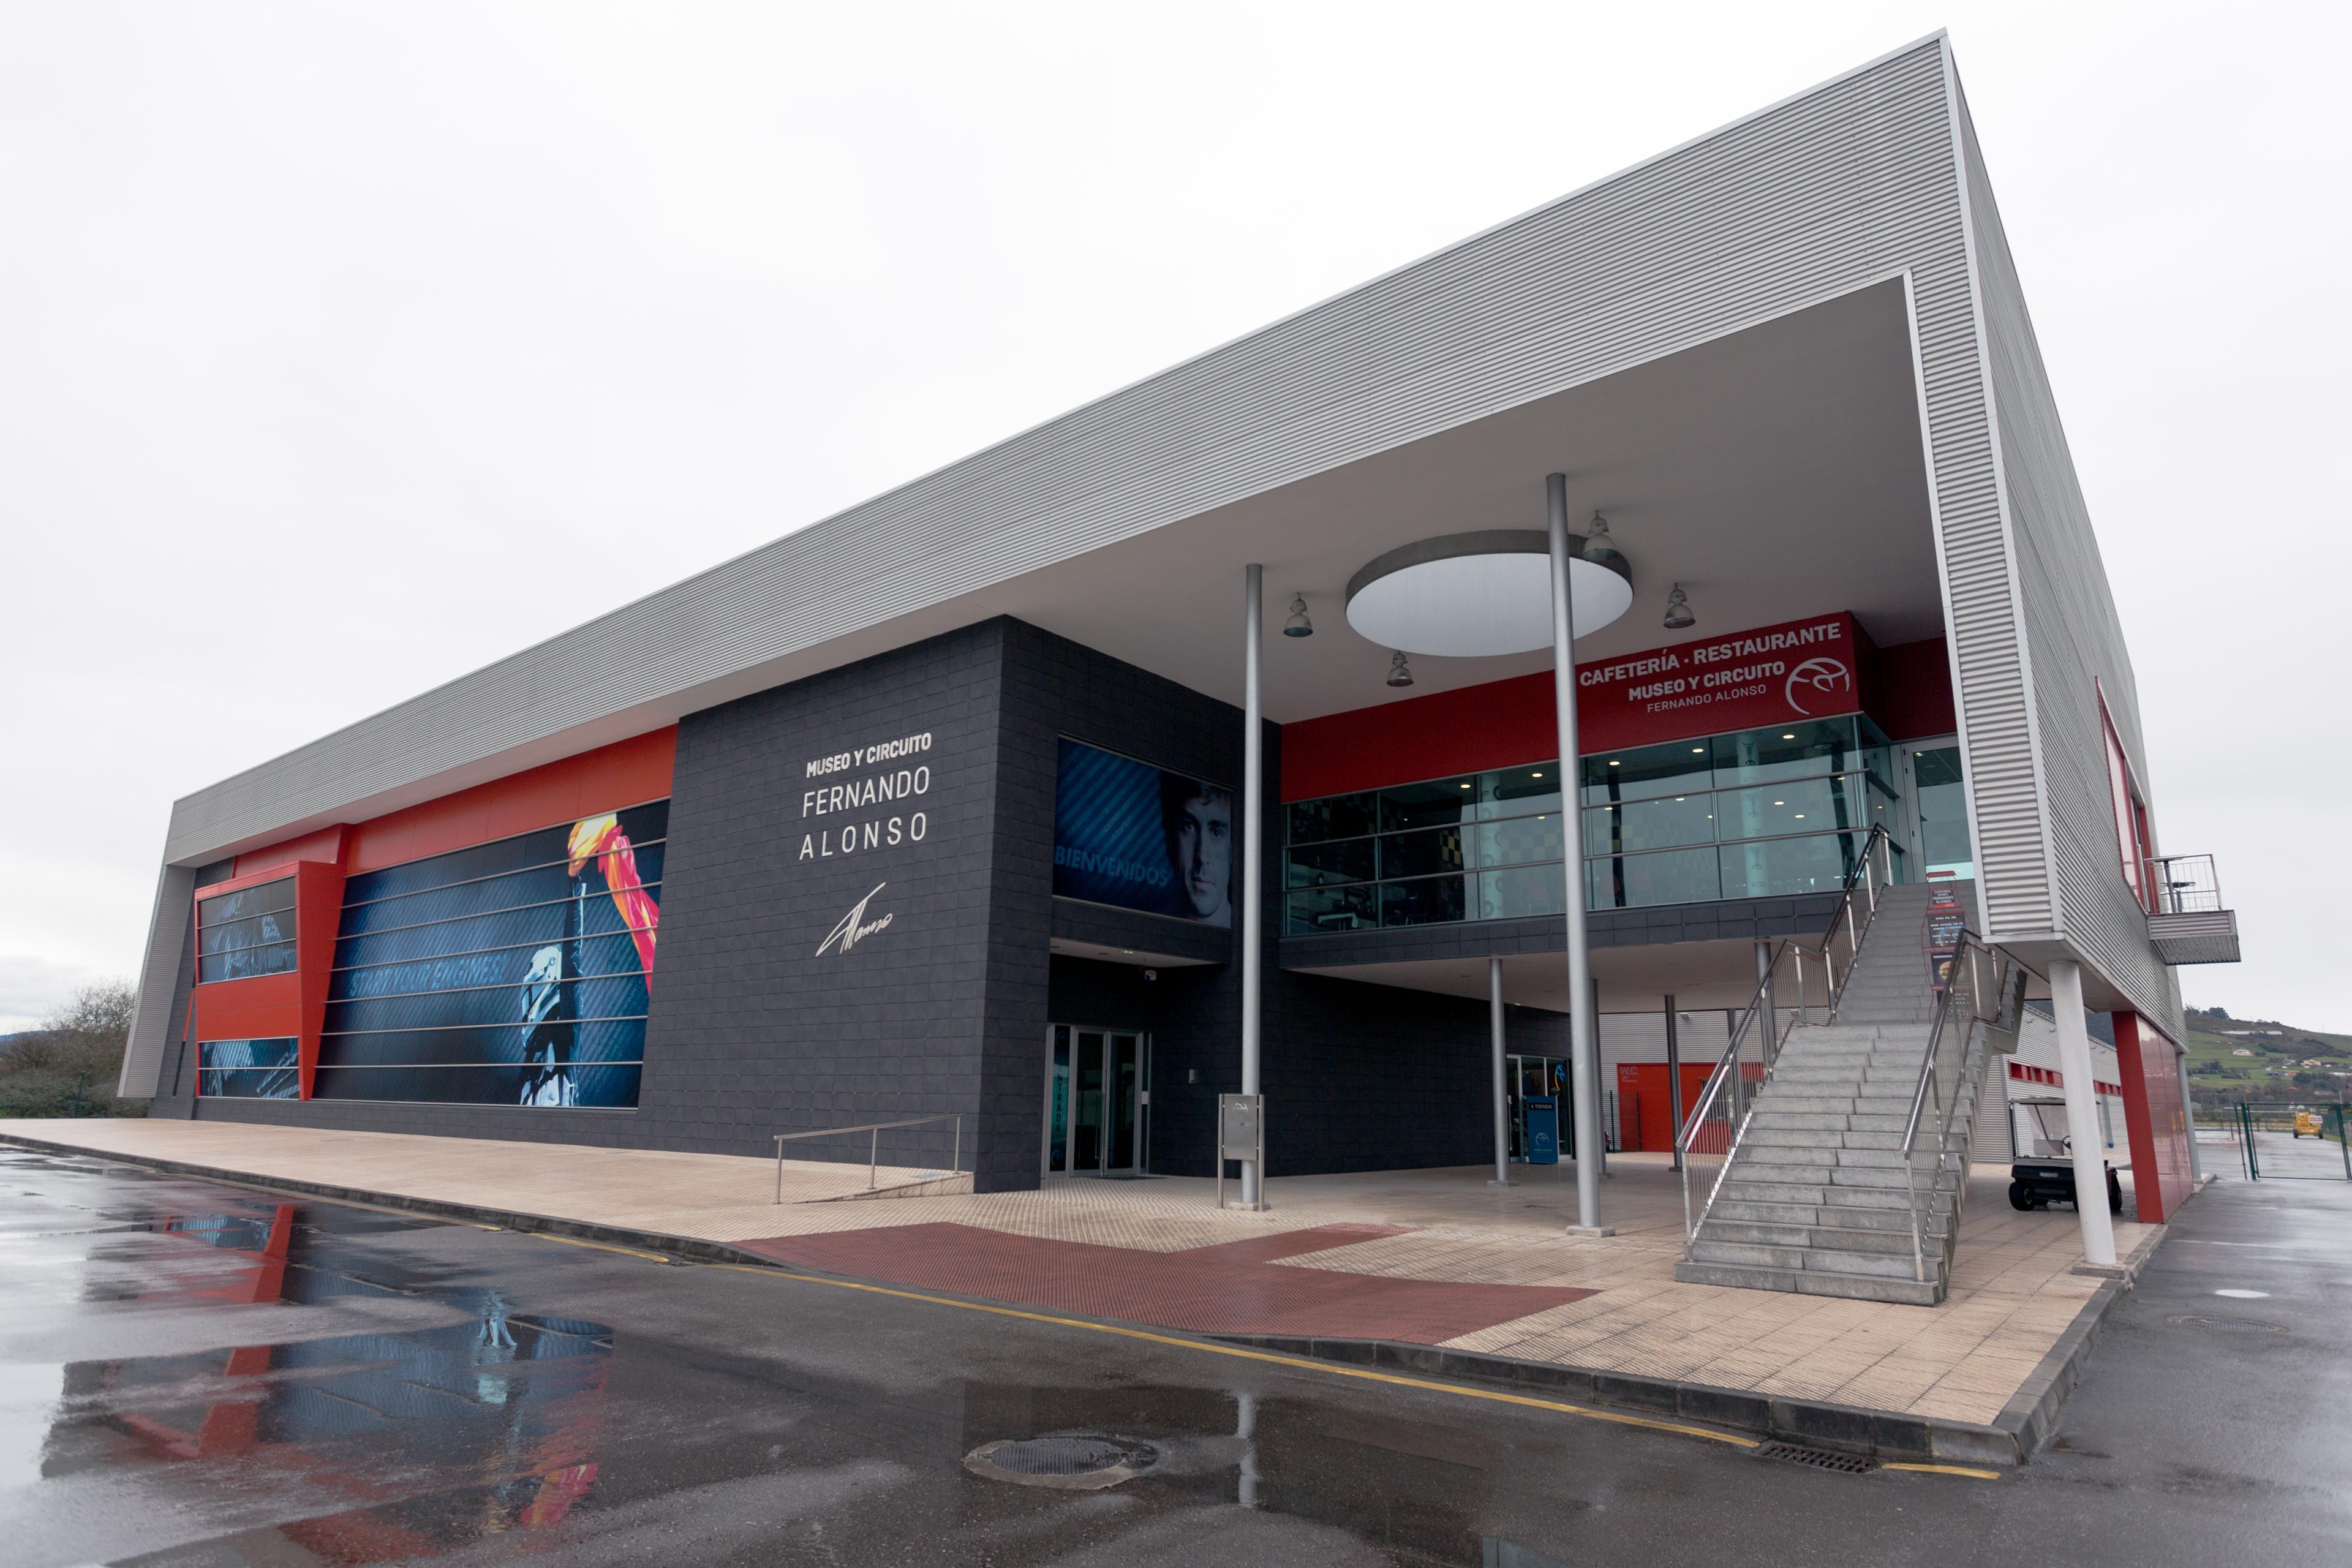 Museo Y Circuito Fernando Alonso : File museo fernando alonso entrance march g wikimedia commons